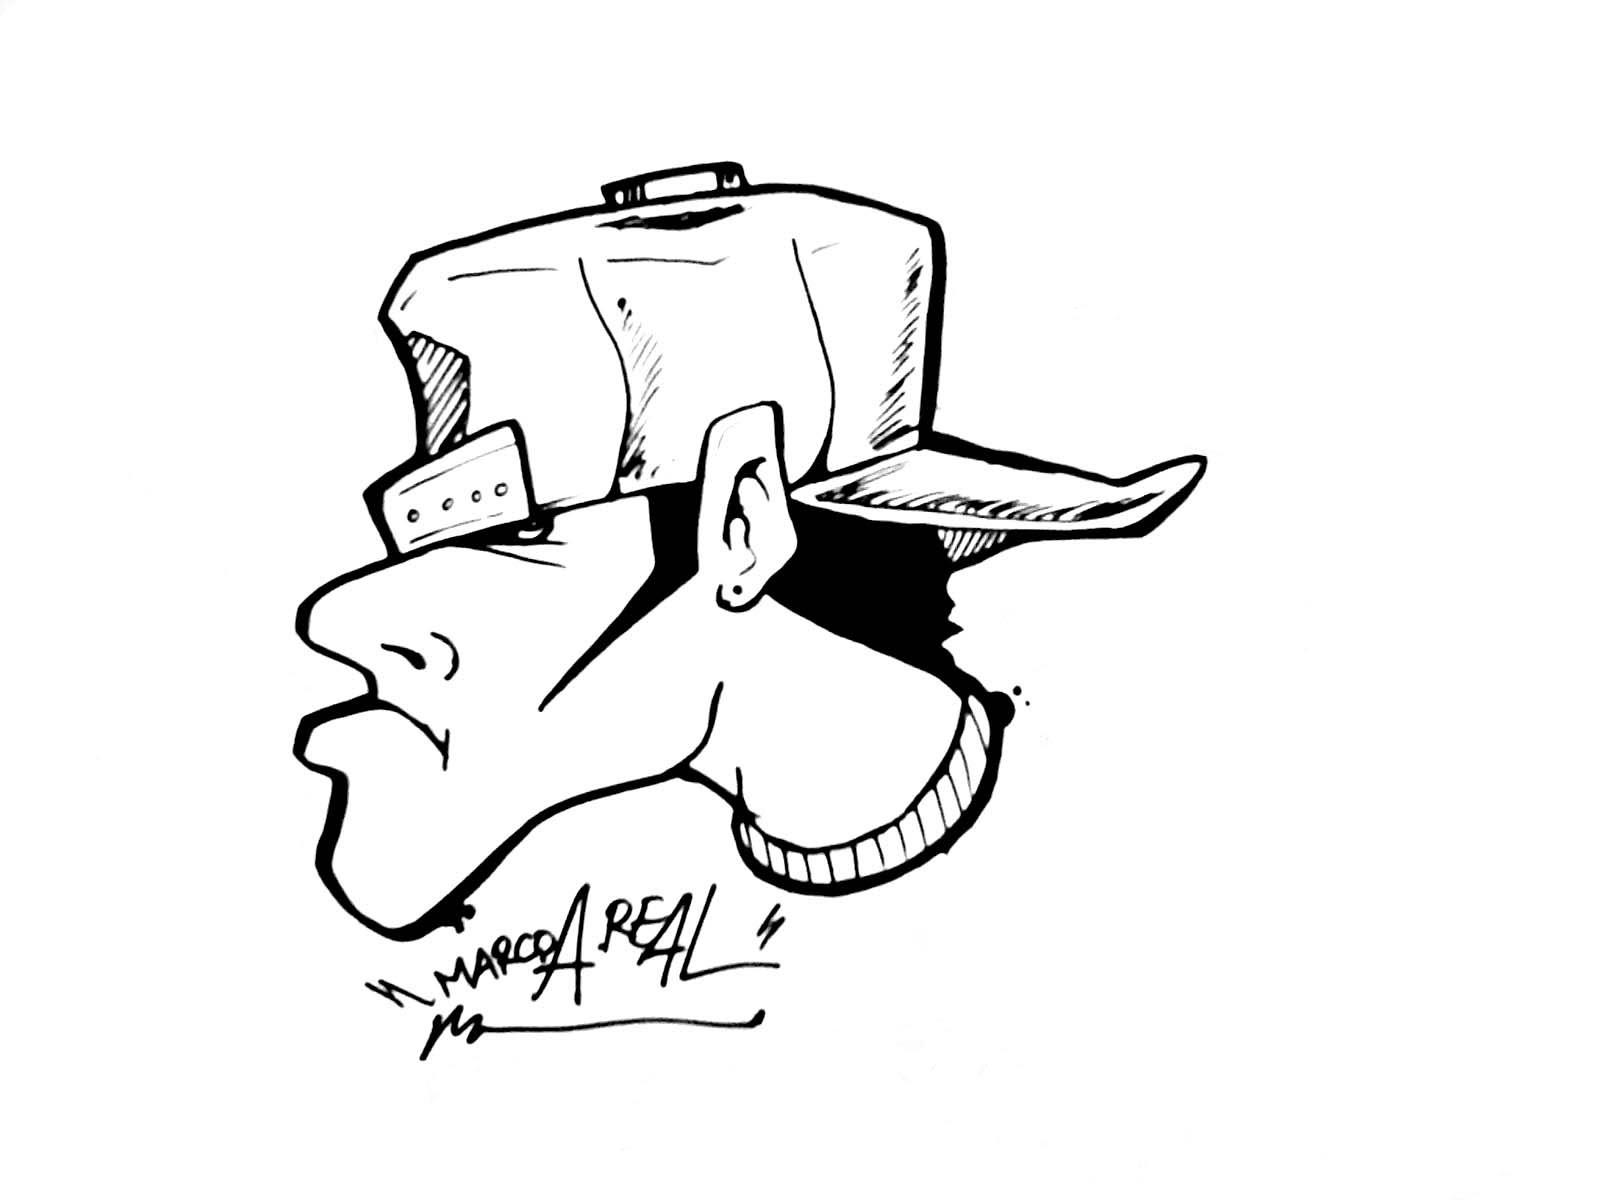 1600x1200 Pencil Graffiti Characters How To Draw A Graffiti Characterwizard